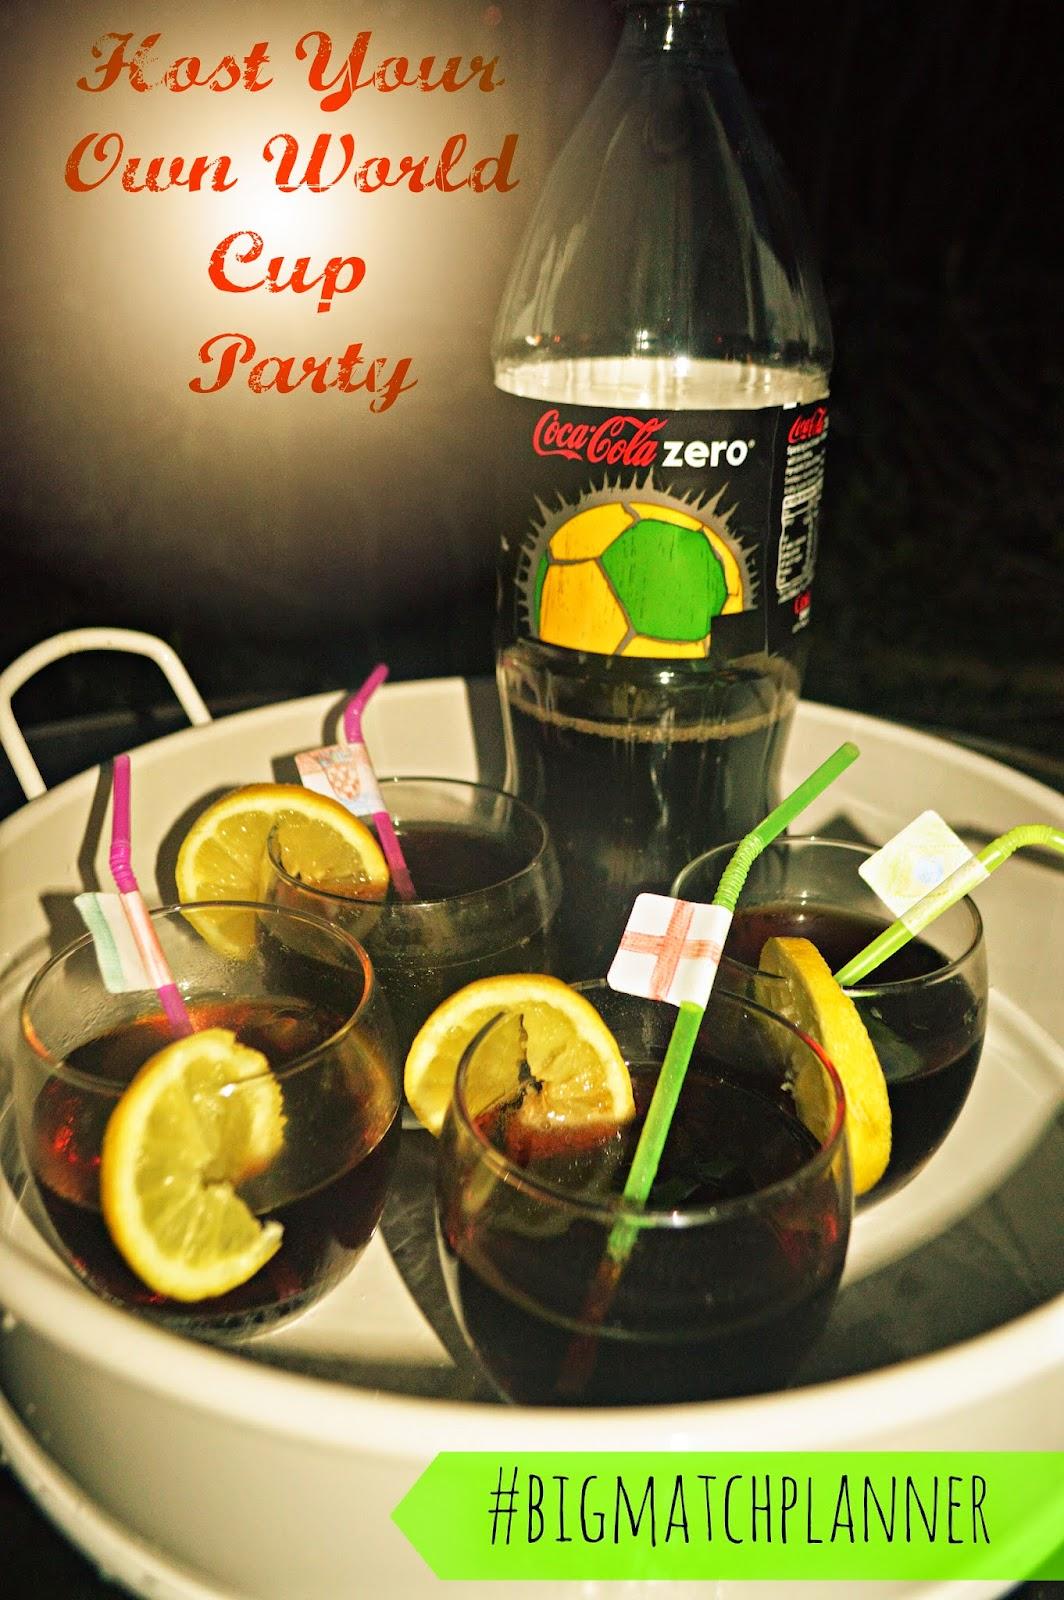 Big Match Planner Party Coca Cola Zero Refreshments CBIAS FIFA World Cup Brazil 2014 #bigmatchplanner #cbias